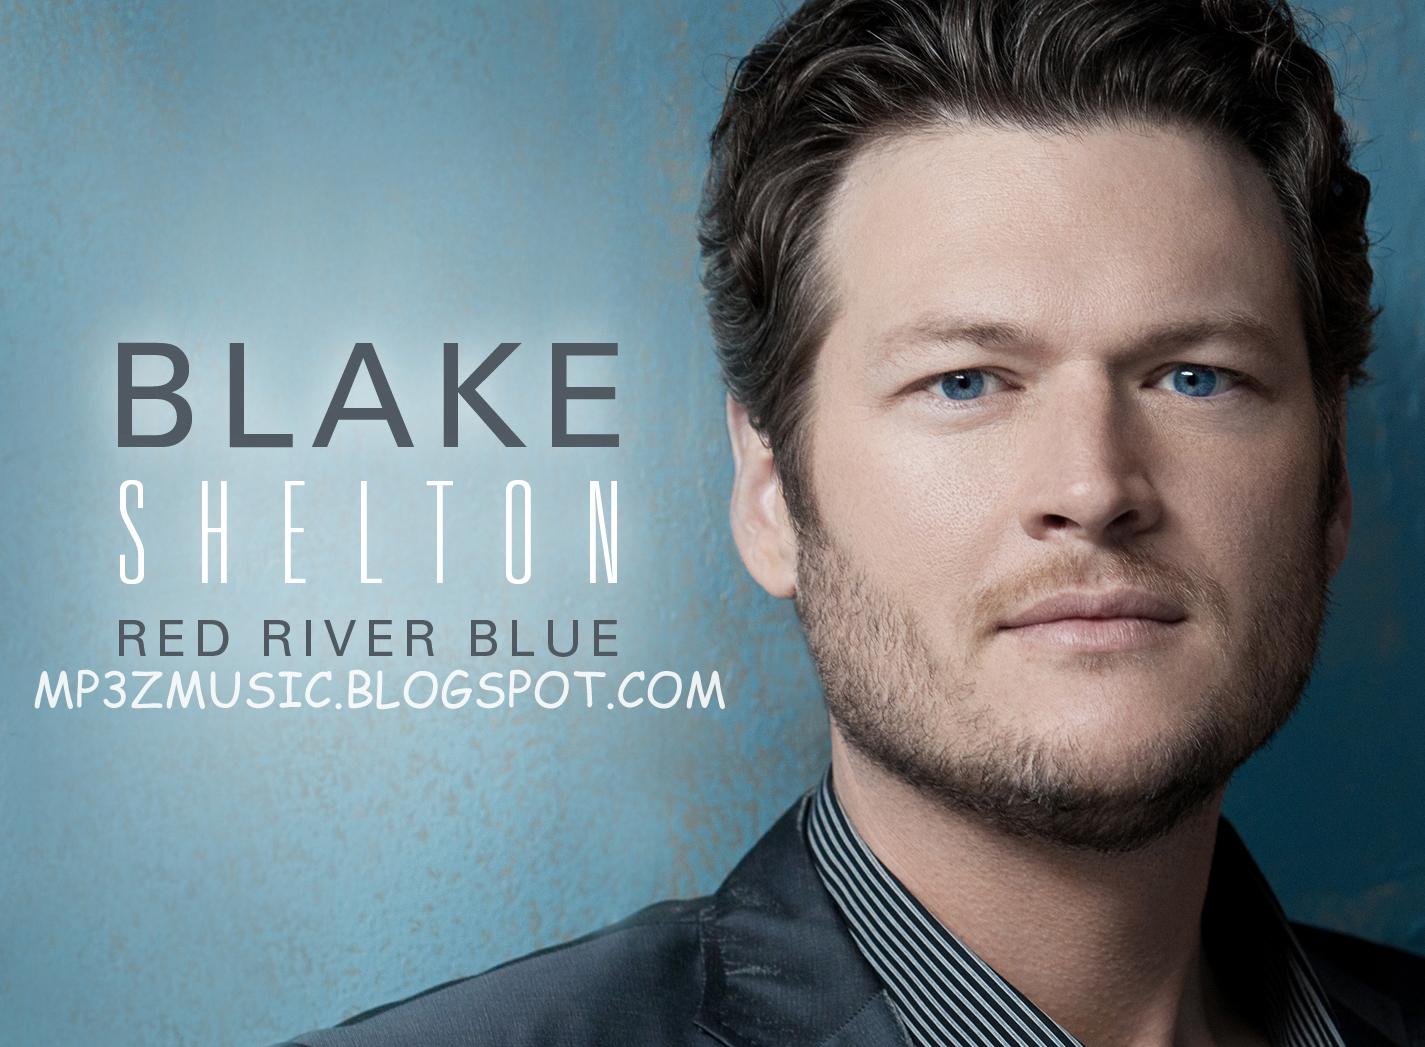 http://3.bp.blogspot.com/-psZlJs4xrkg/TnnlfYaPh1I/AAAAAAAAACc/qcshVIb2Hro/s1600/BLAKE+Shelton+Red+River+Blue+-+CountryMusicRocks.jpg